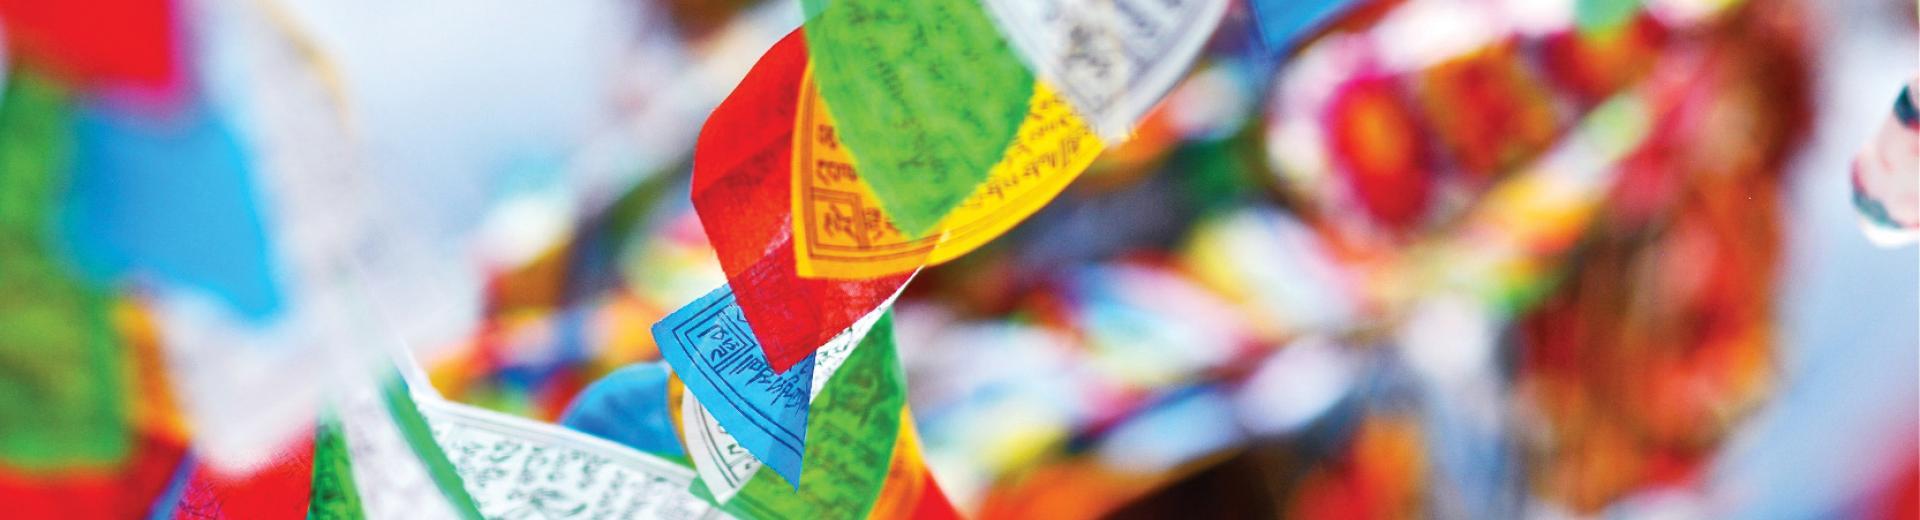 Tibetan Prayer Flags at Festival